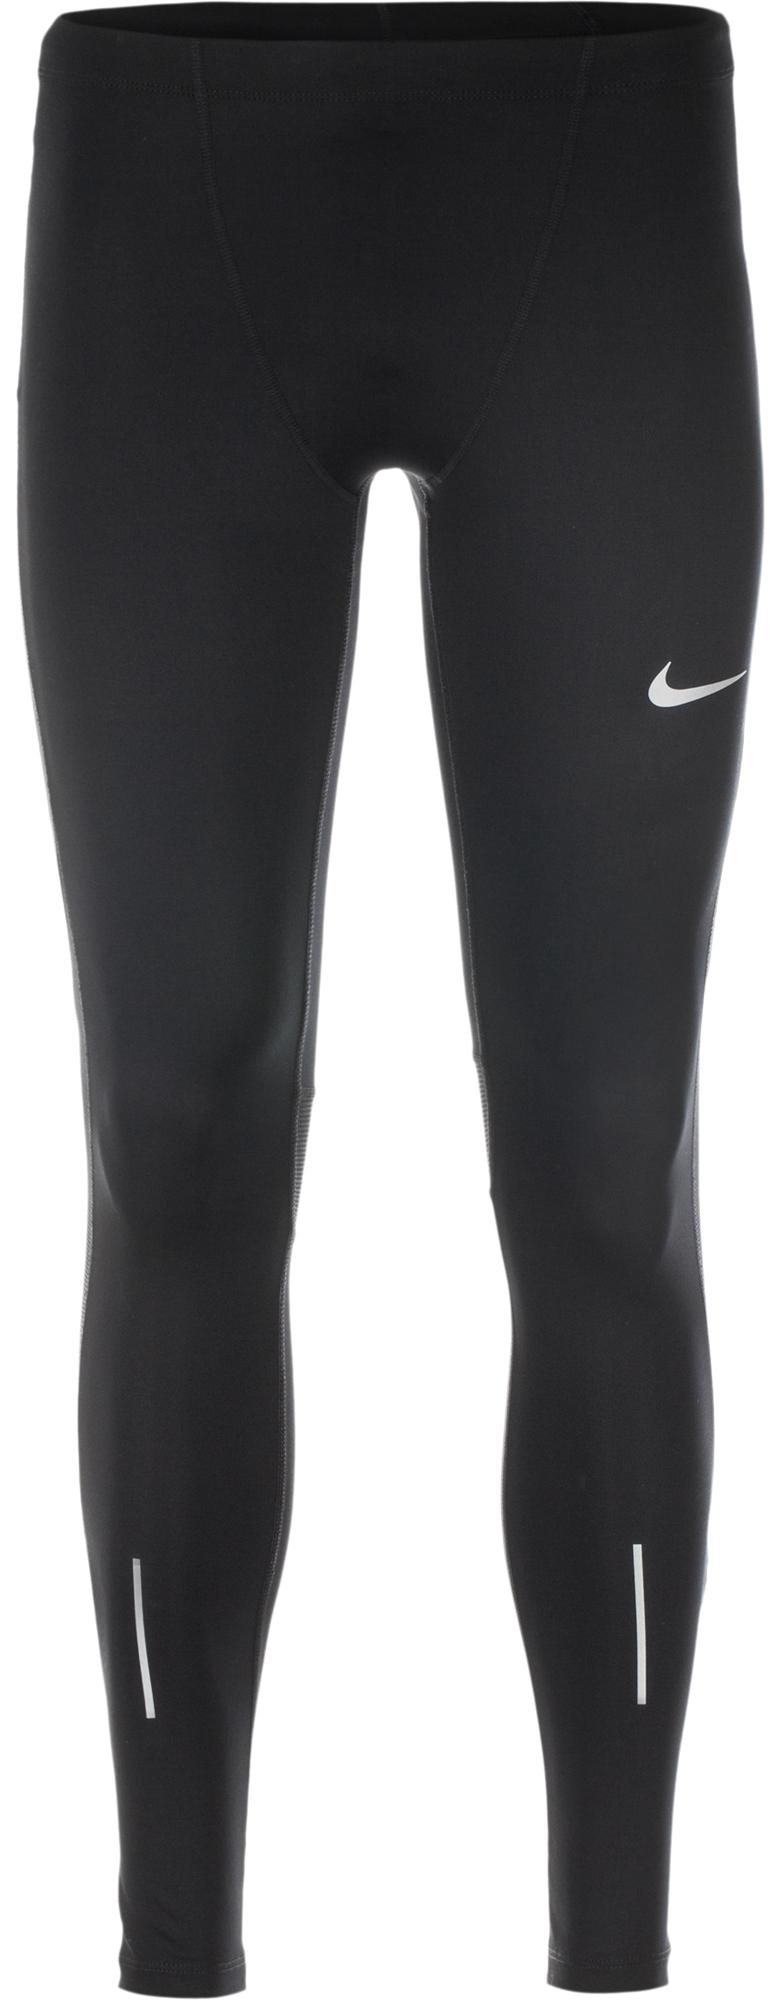 Nike Легинсы мужские Nike Power